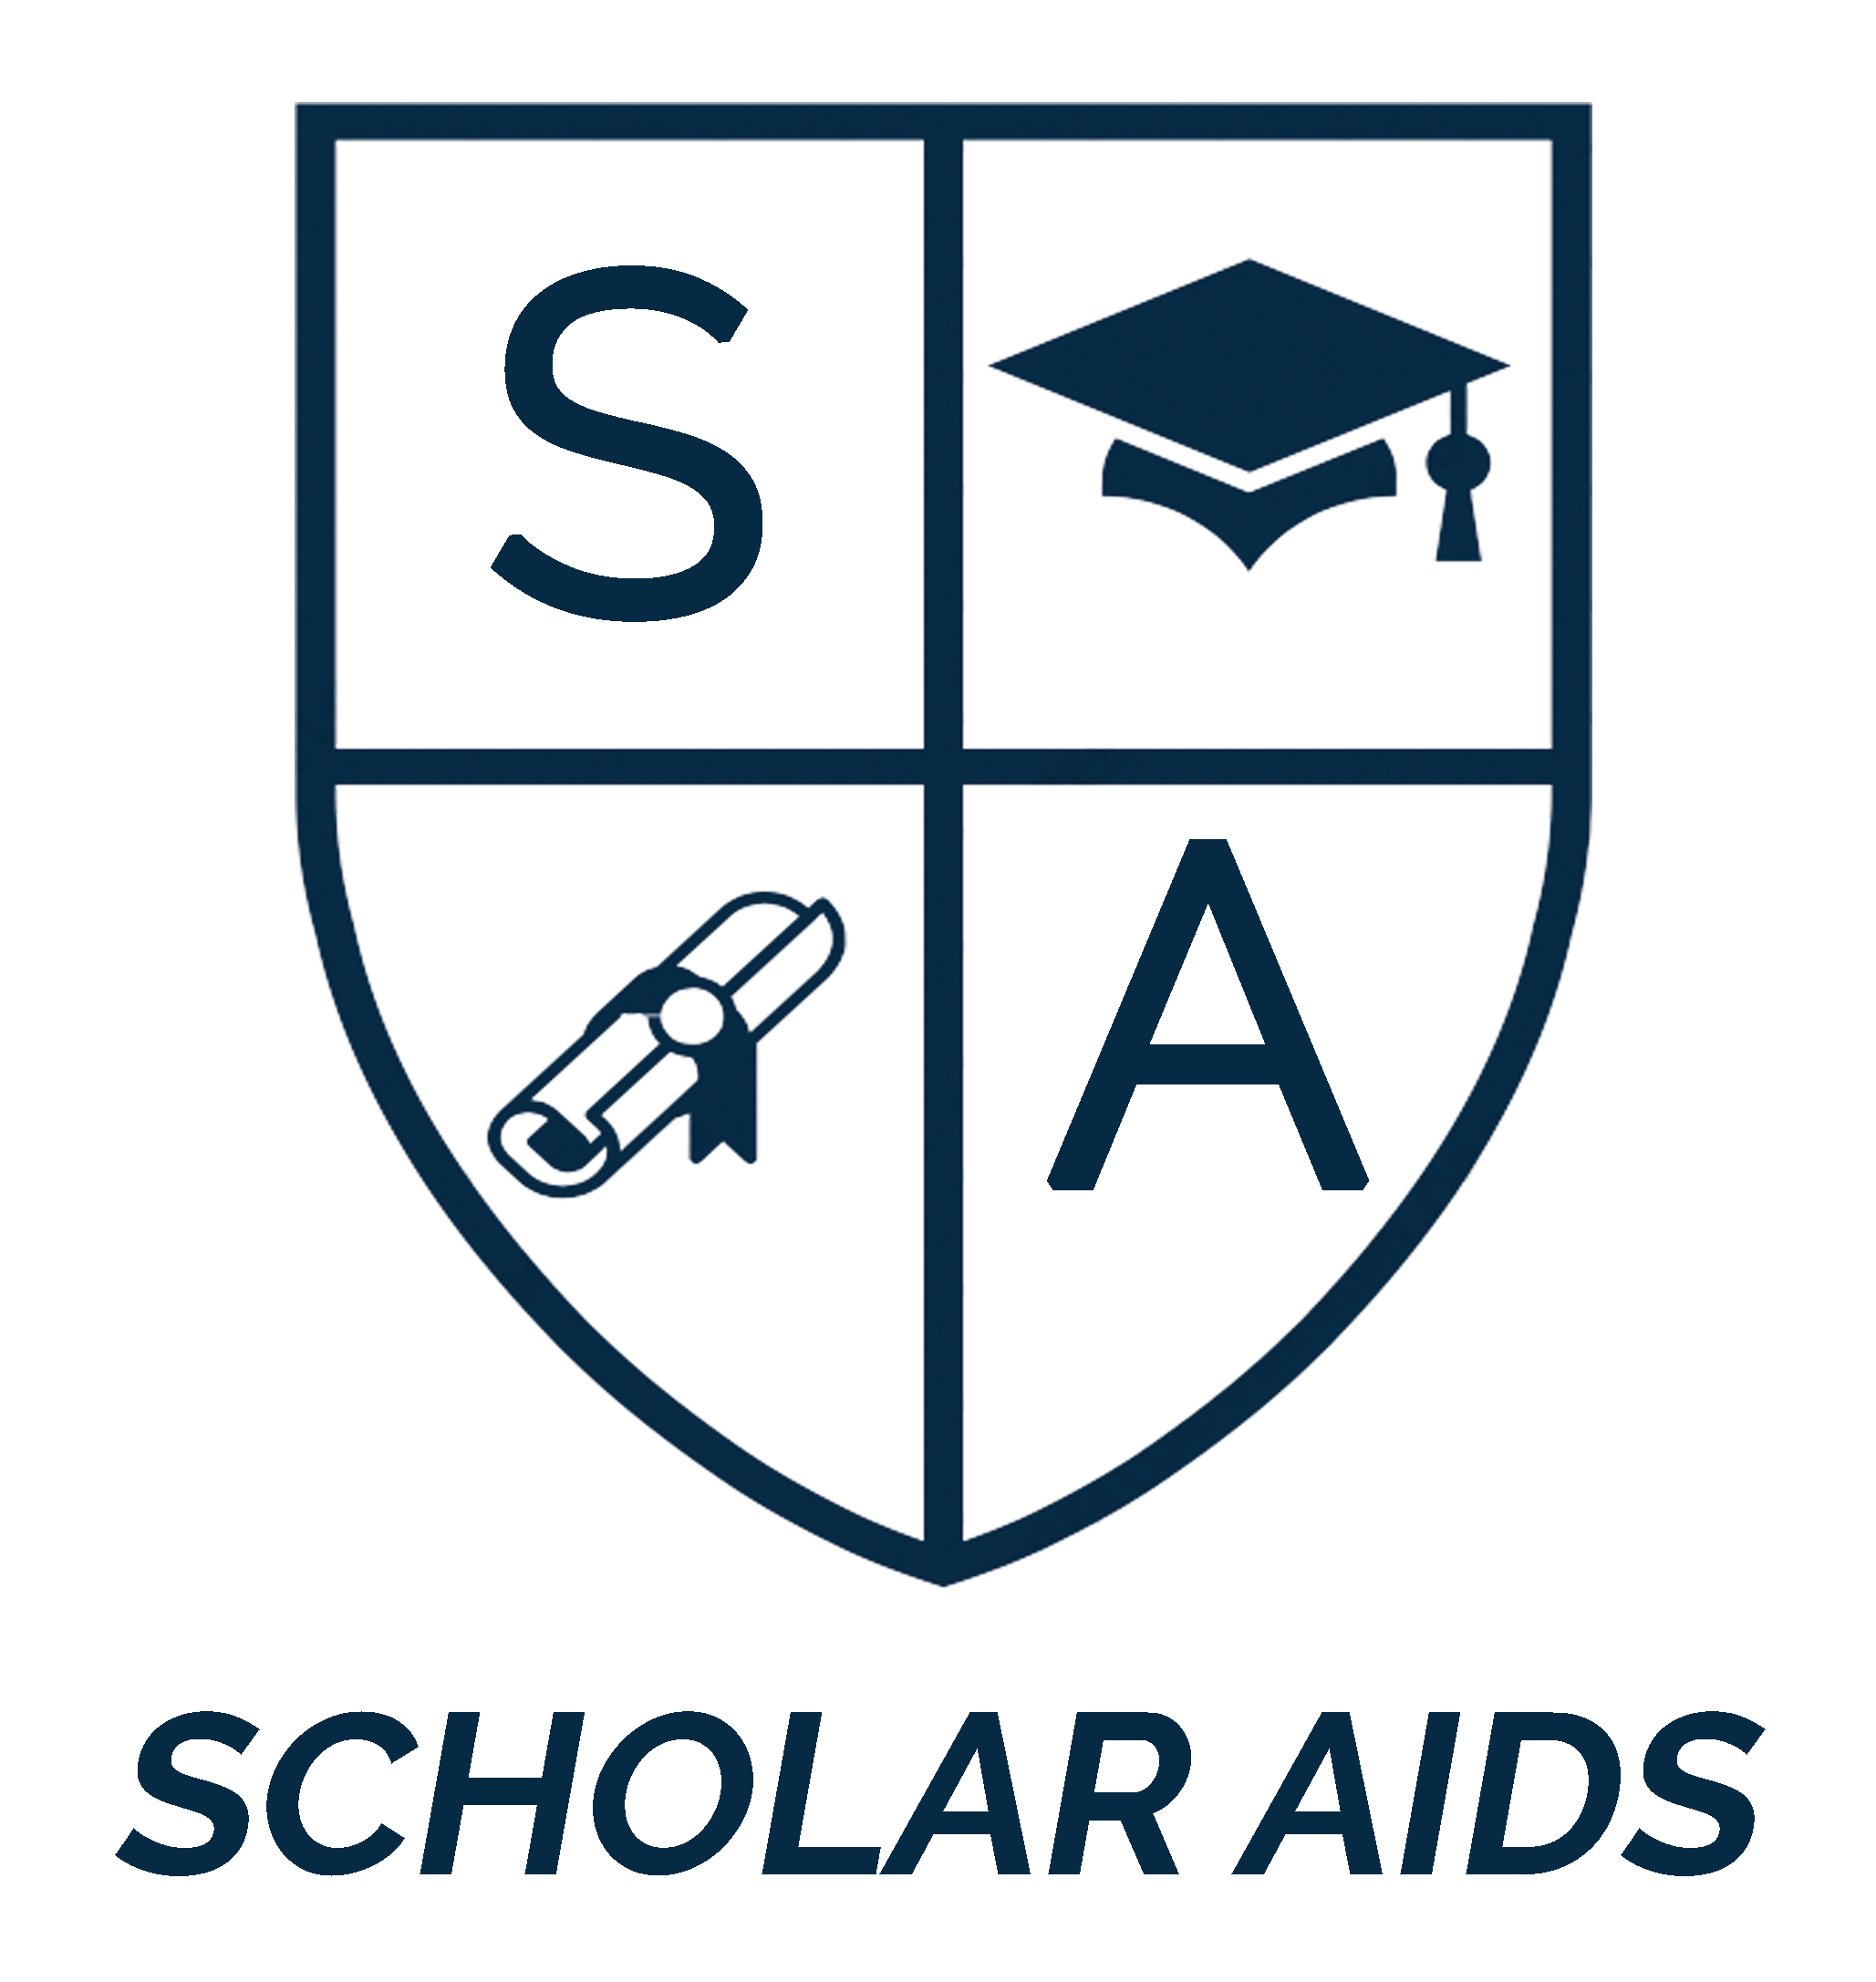 Scholar Aids